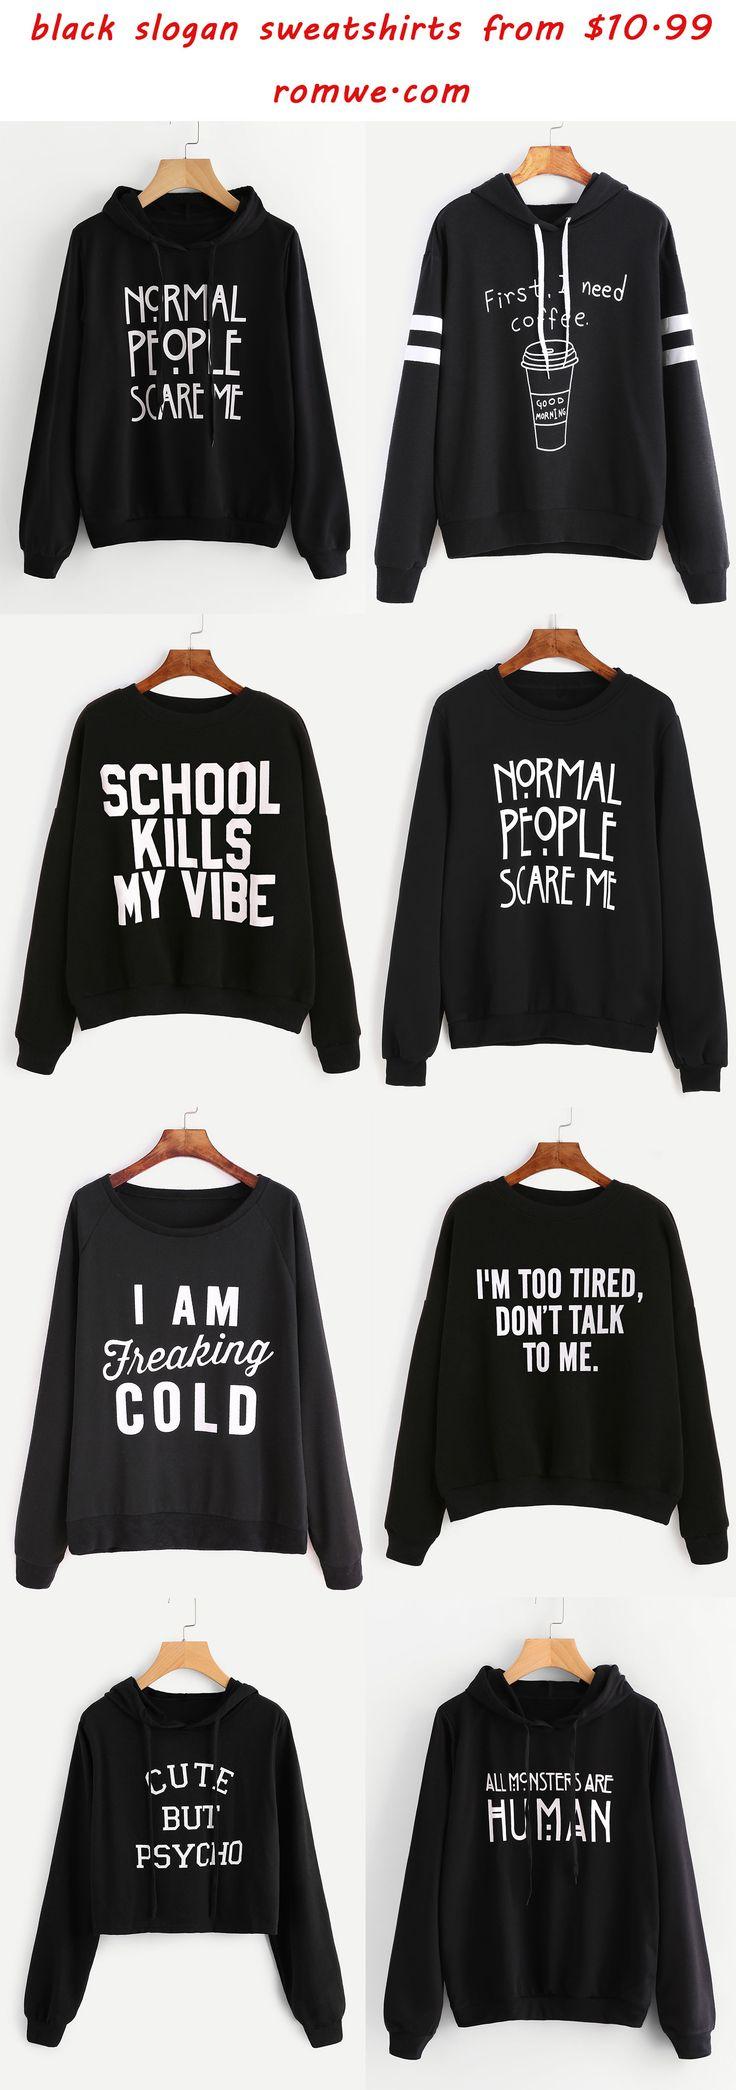 black slogan sweatshirts - romwe.com